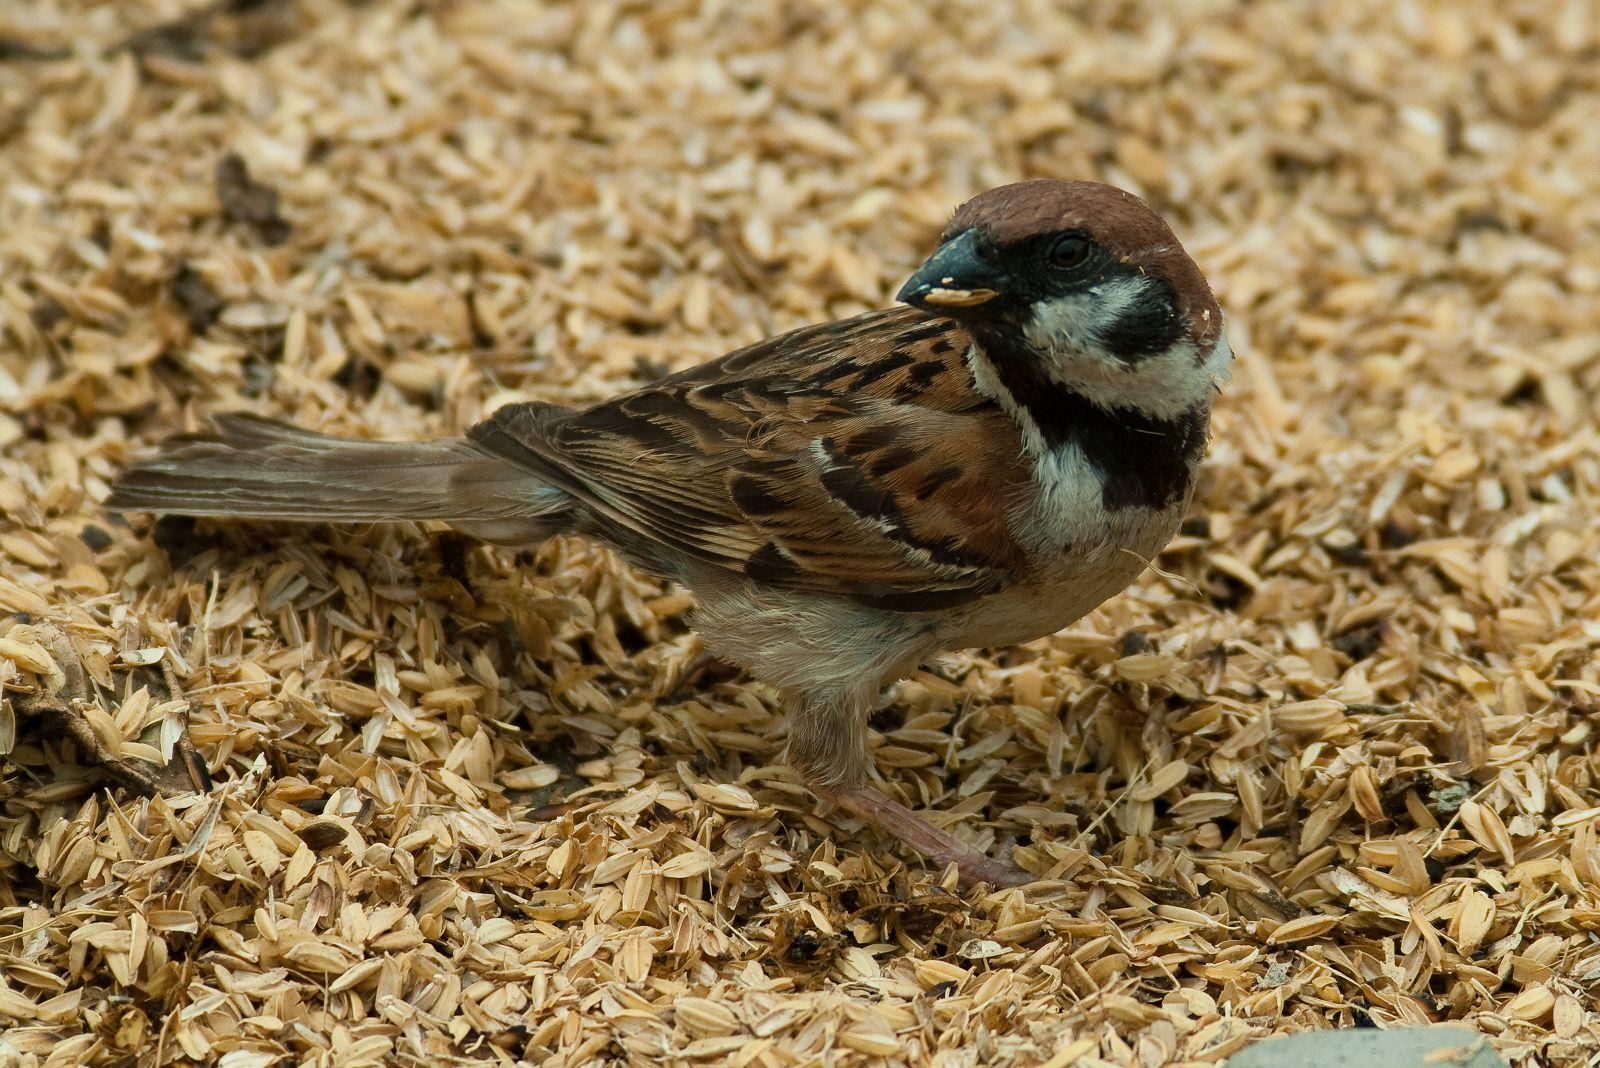 AFボーグ BORG60EDで撮影した野鳥・スズメの写真画像